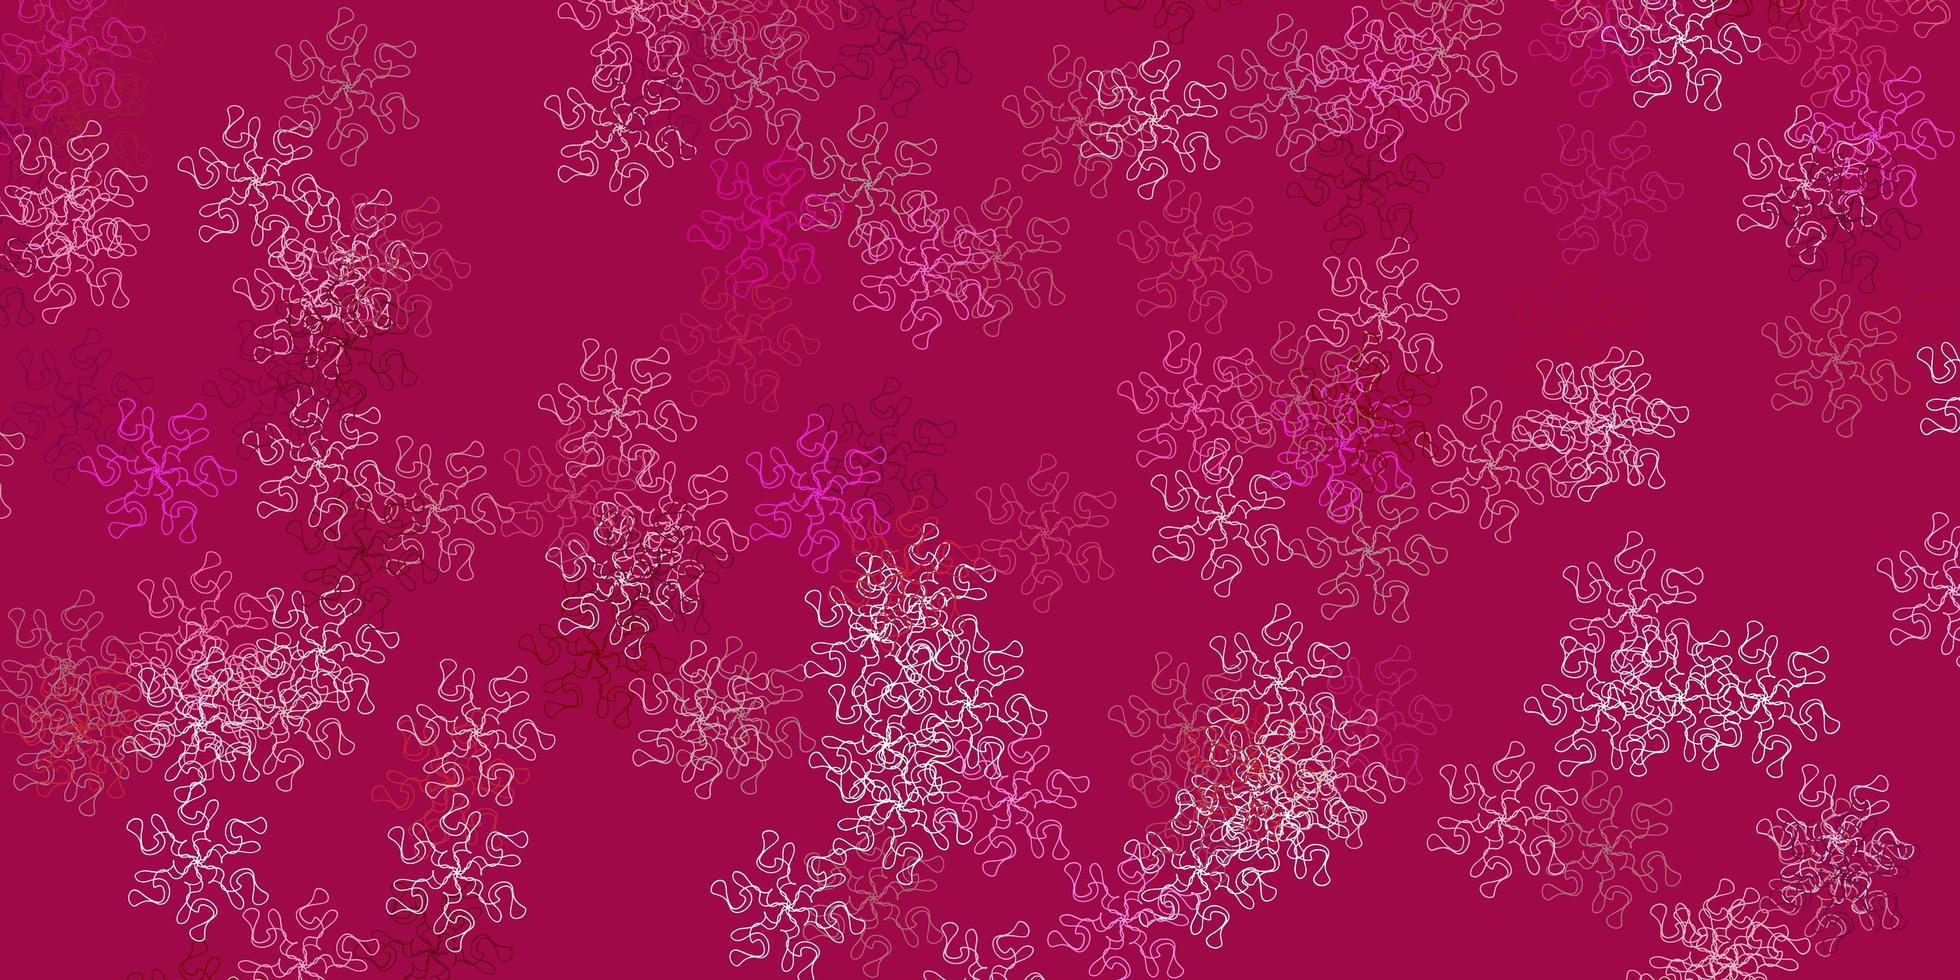 ljusrosa vektor doodle bakgrund med blommor.